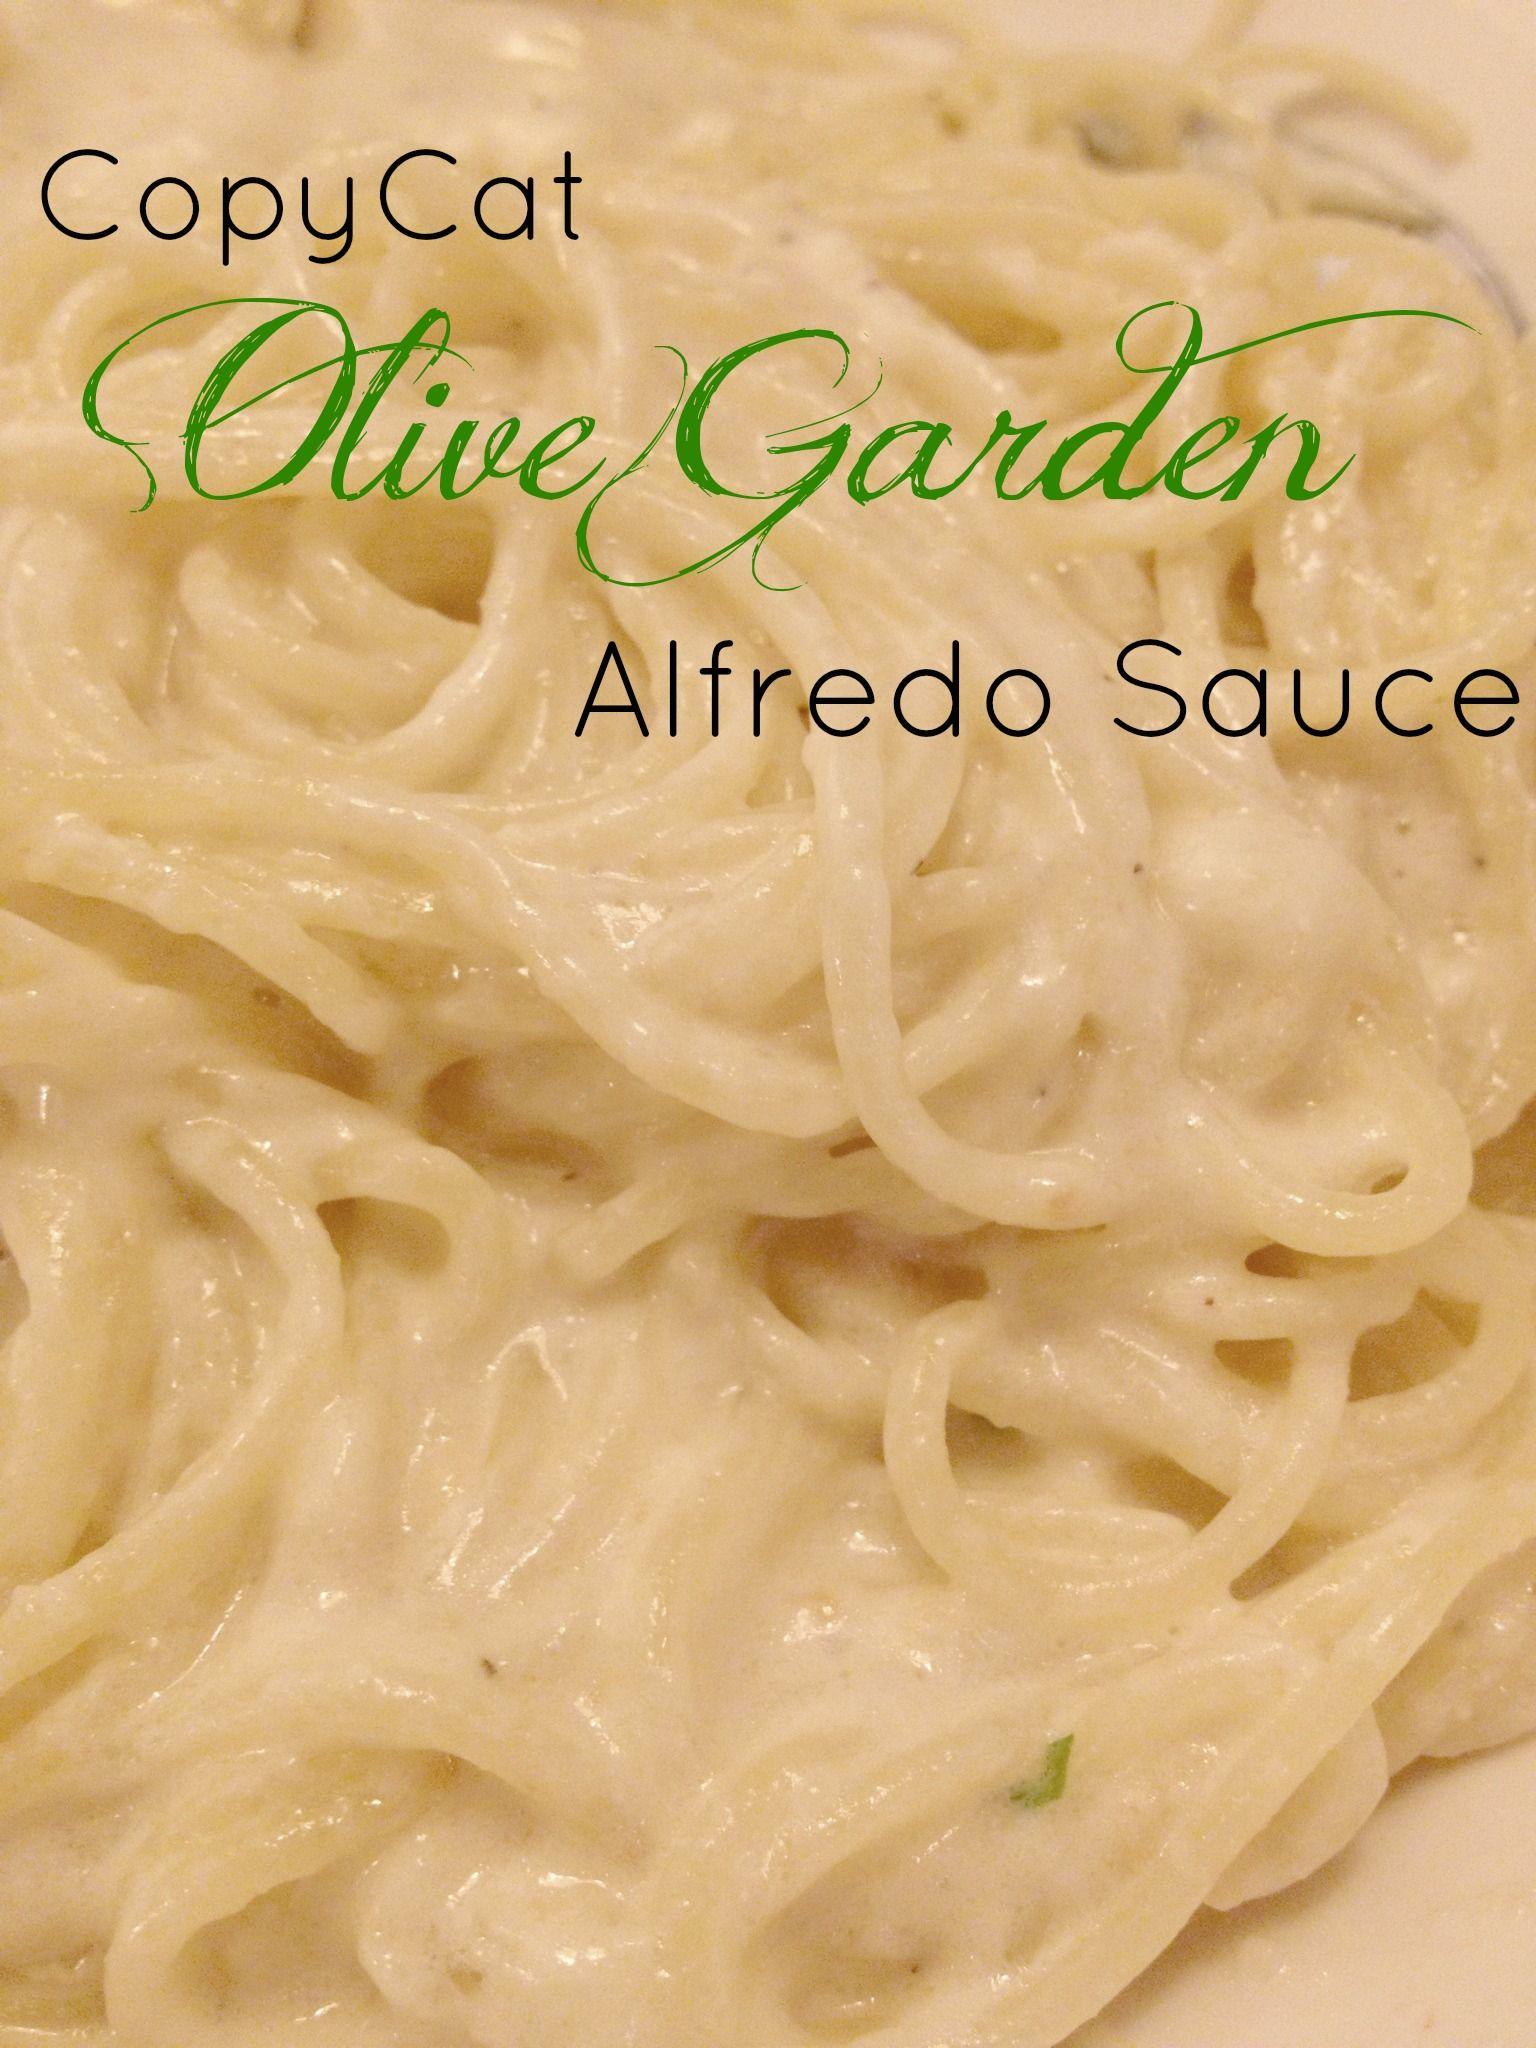 CopyCat Olive Garden Alfredo Sauce recipe I changed it